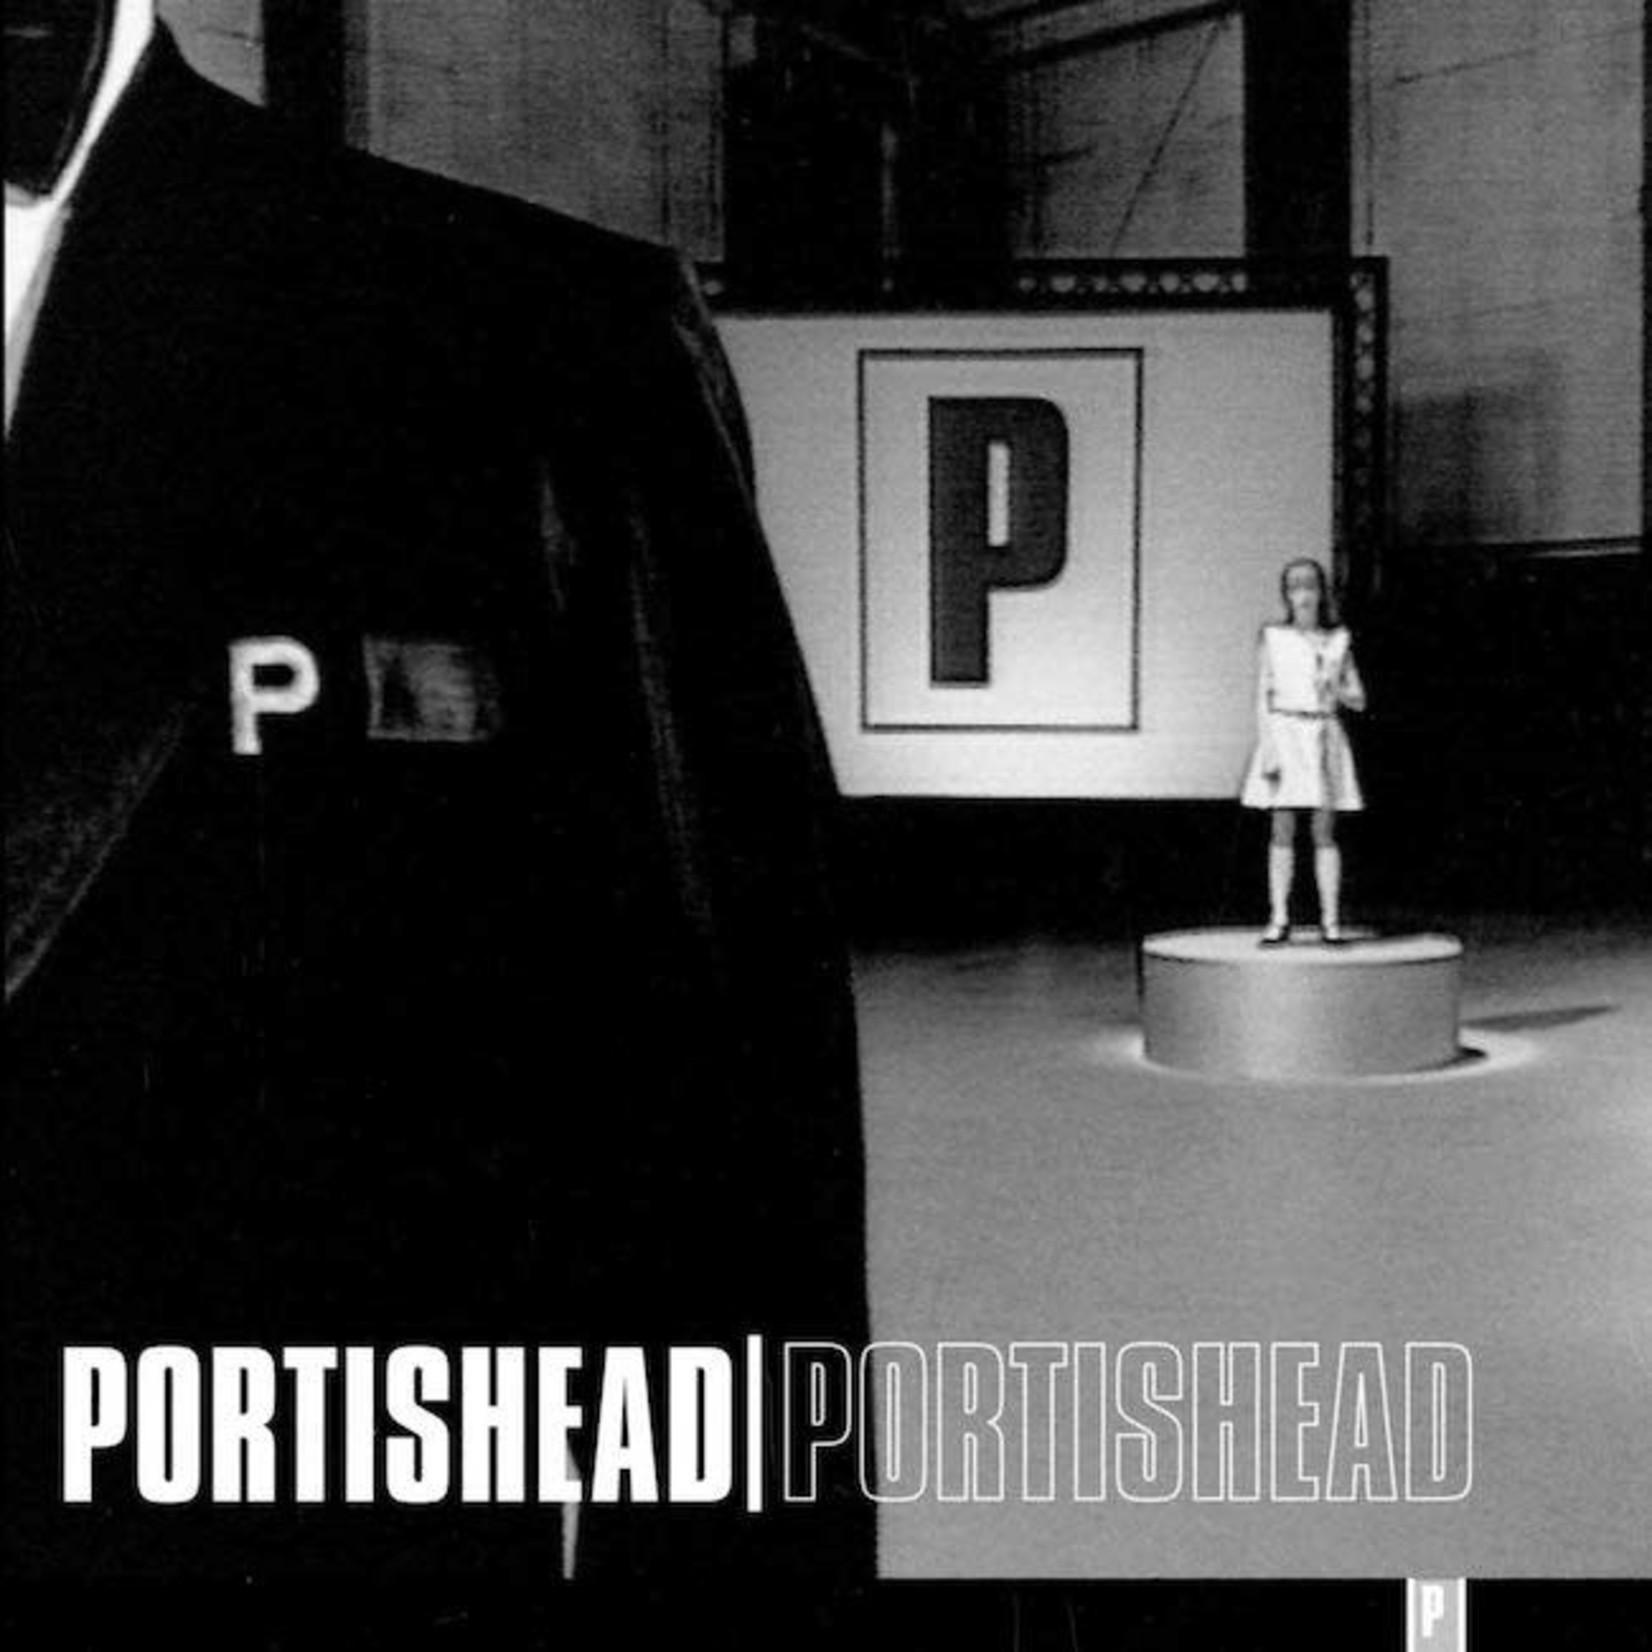 [New] Portishead: self-titled (2LP)